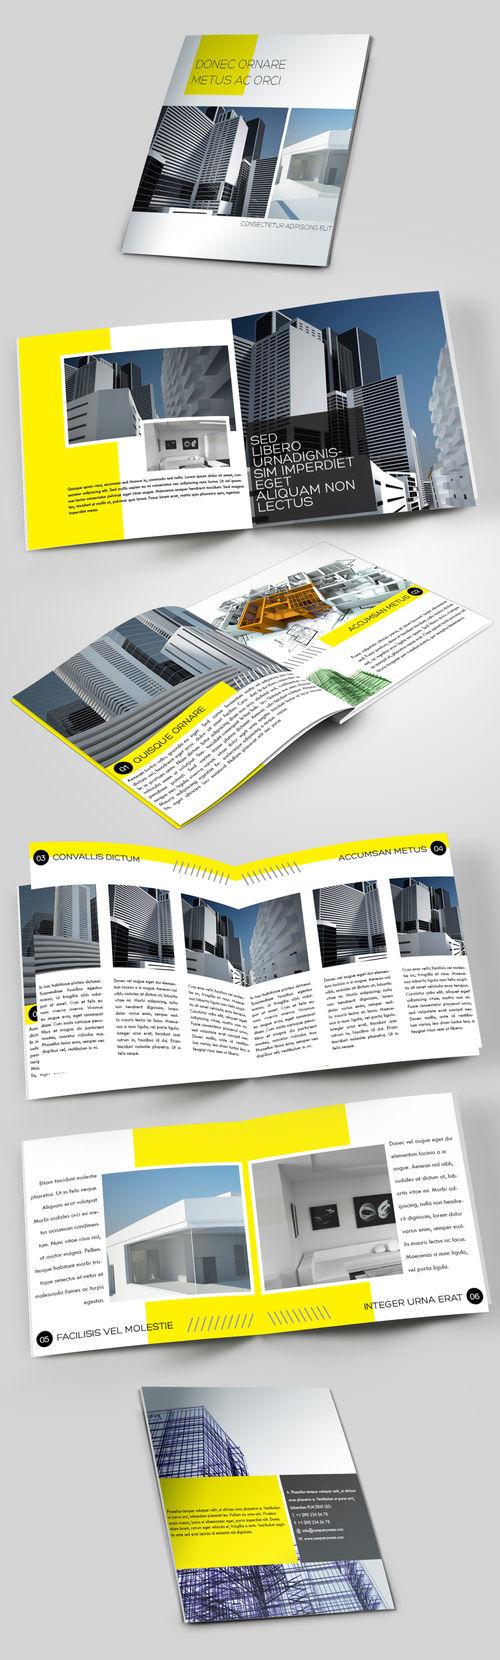 Architects brochure | Design inspiration | Pinterest | Grafikdesign ...